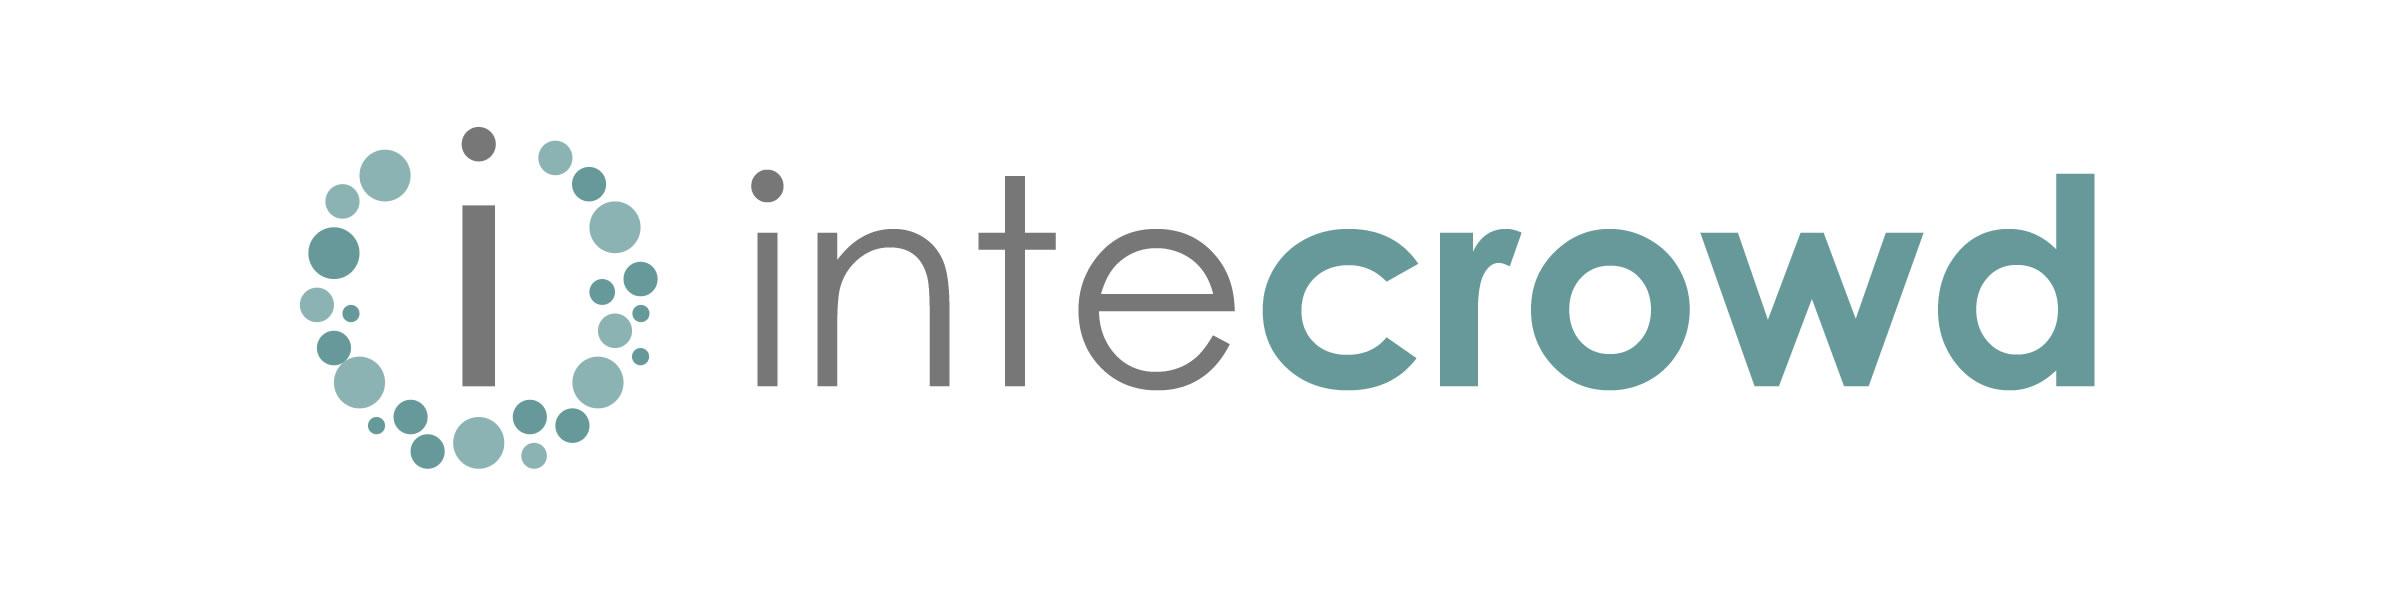 intecrowd_logo.jpg